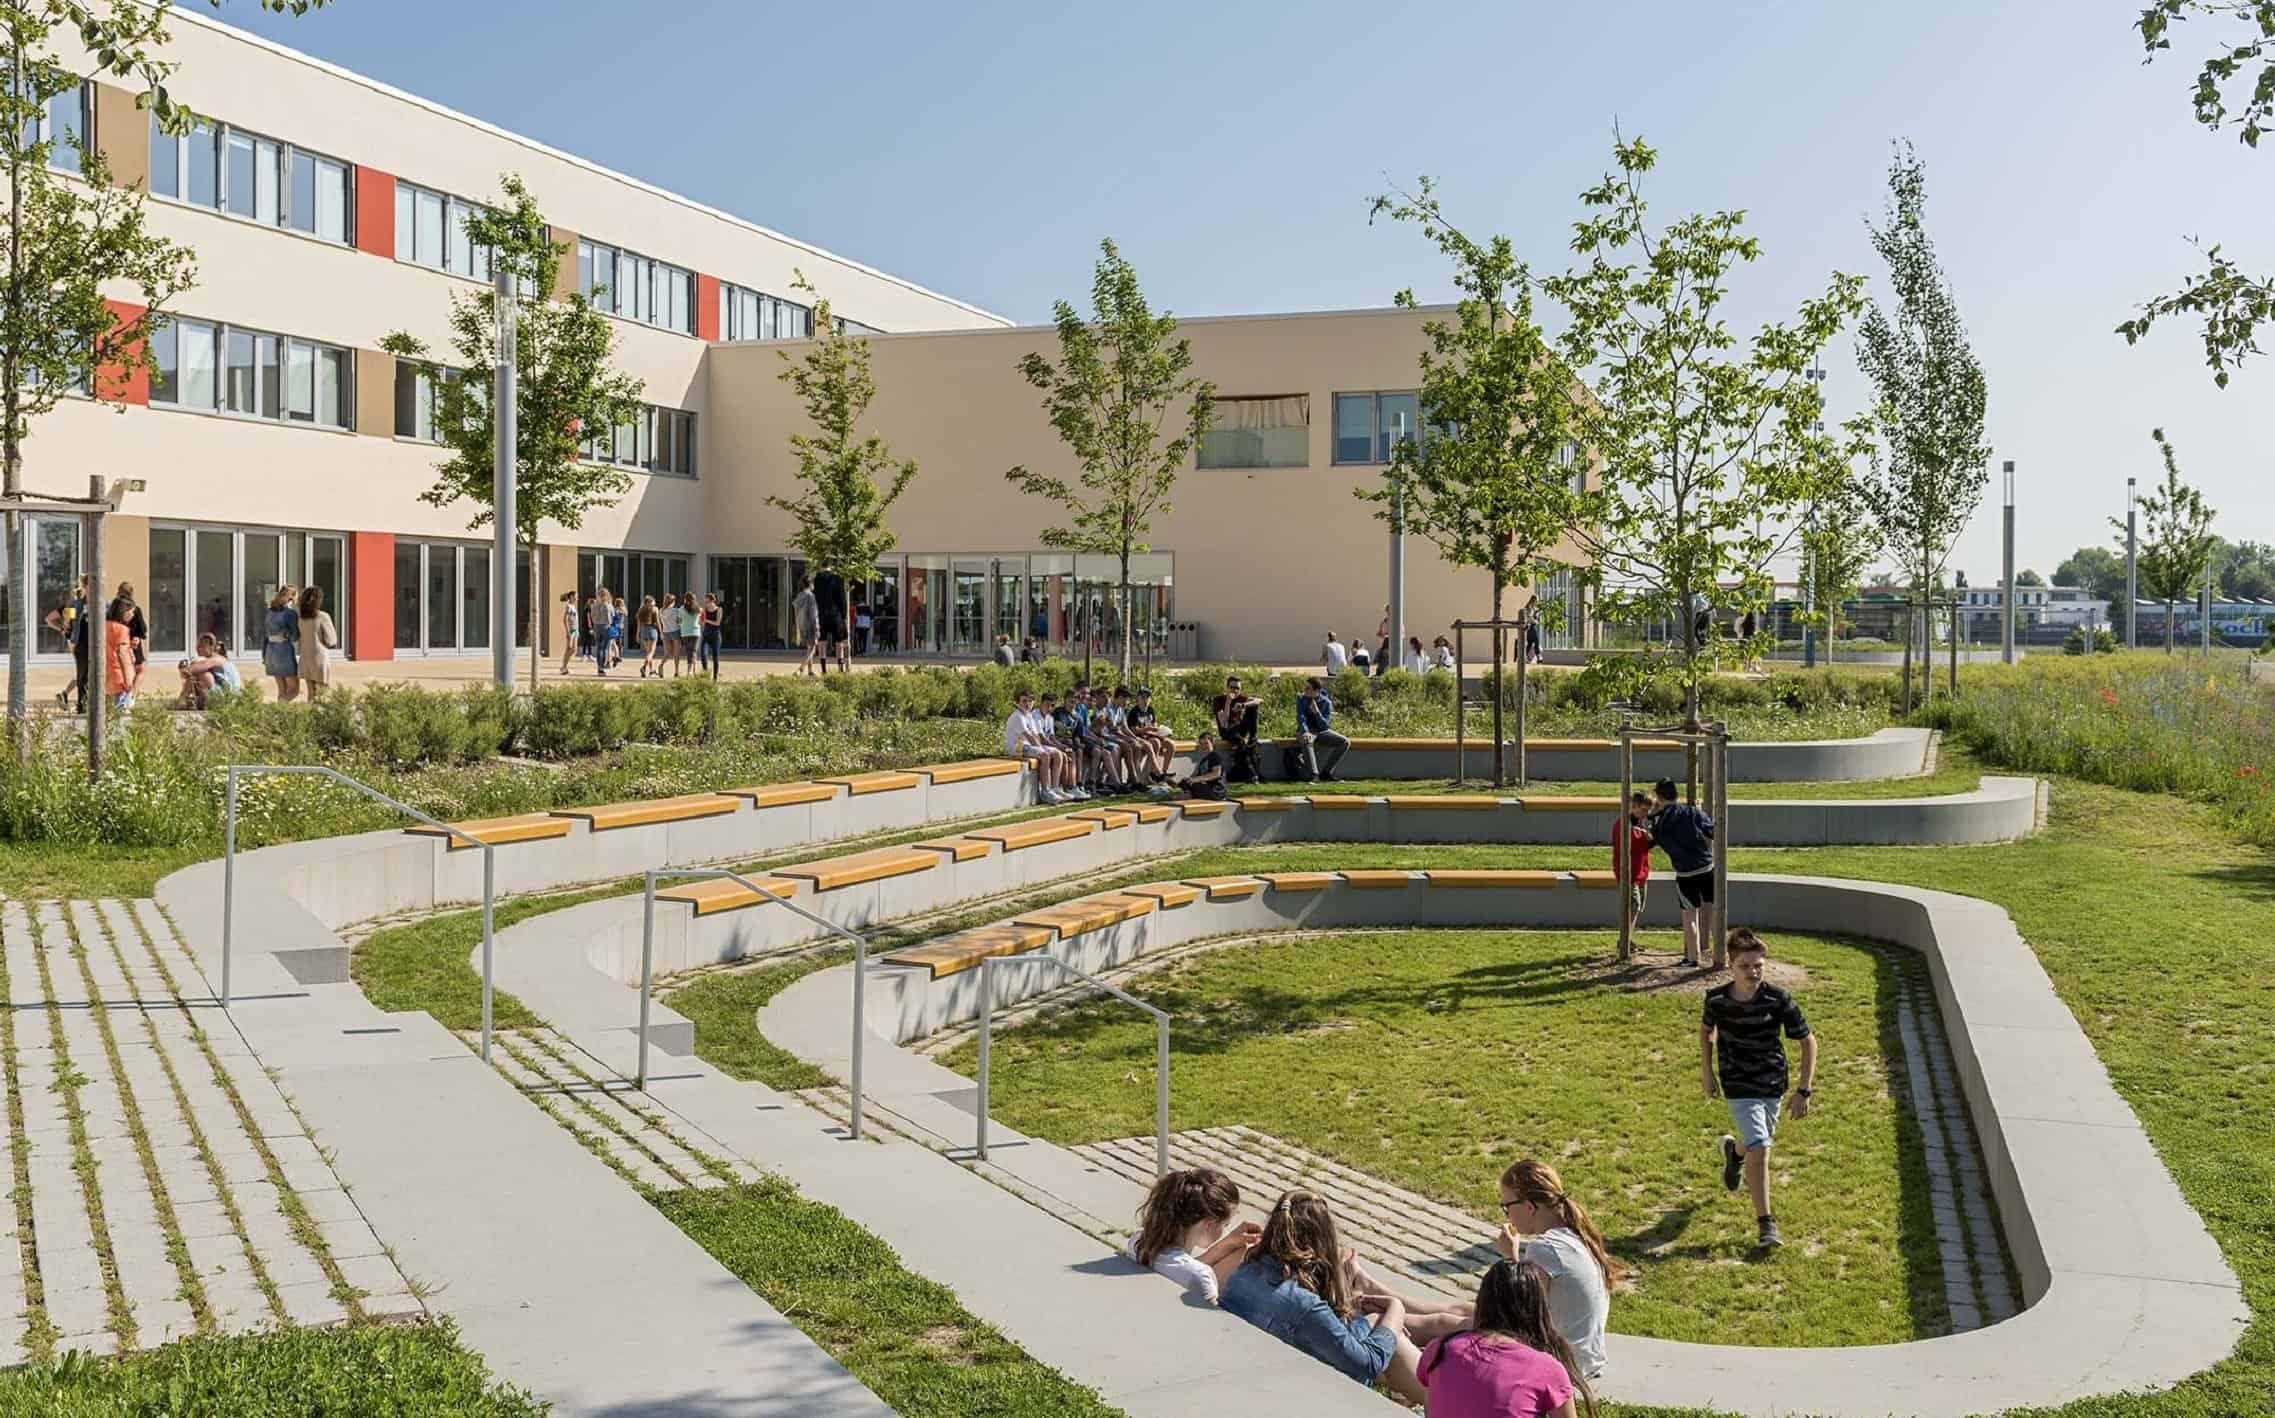 Bild: Grünes Klassenzimmer im Freiraum, Foto: Johann Hinrichs Photography